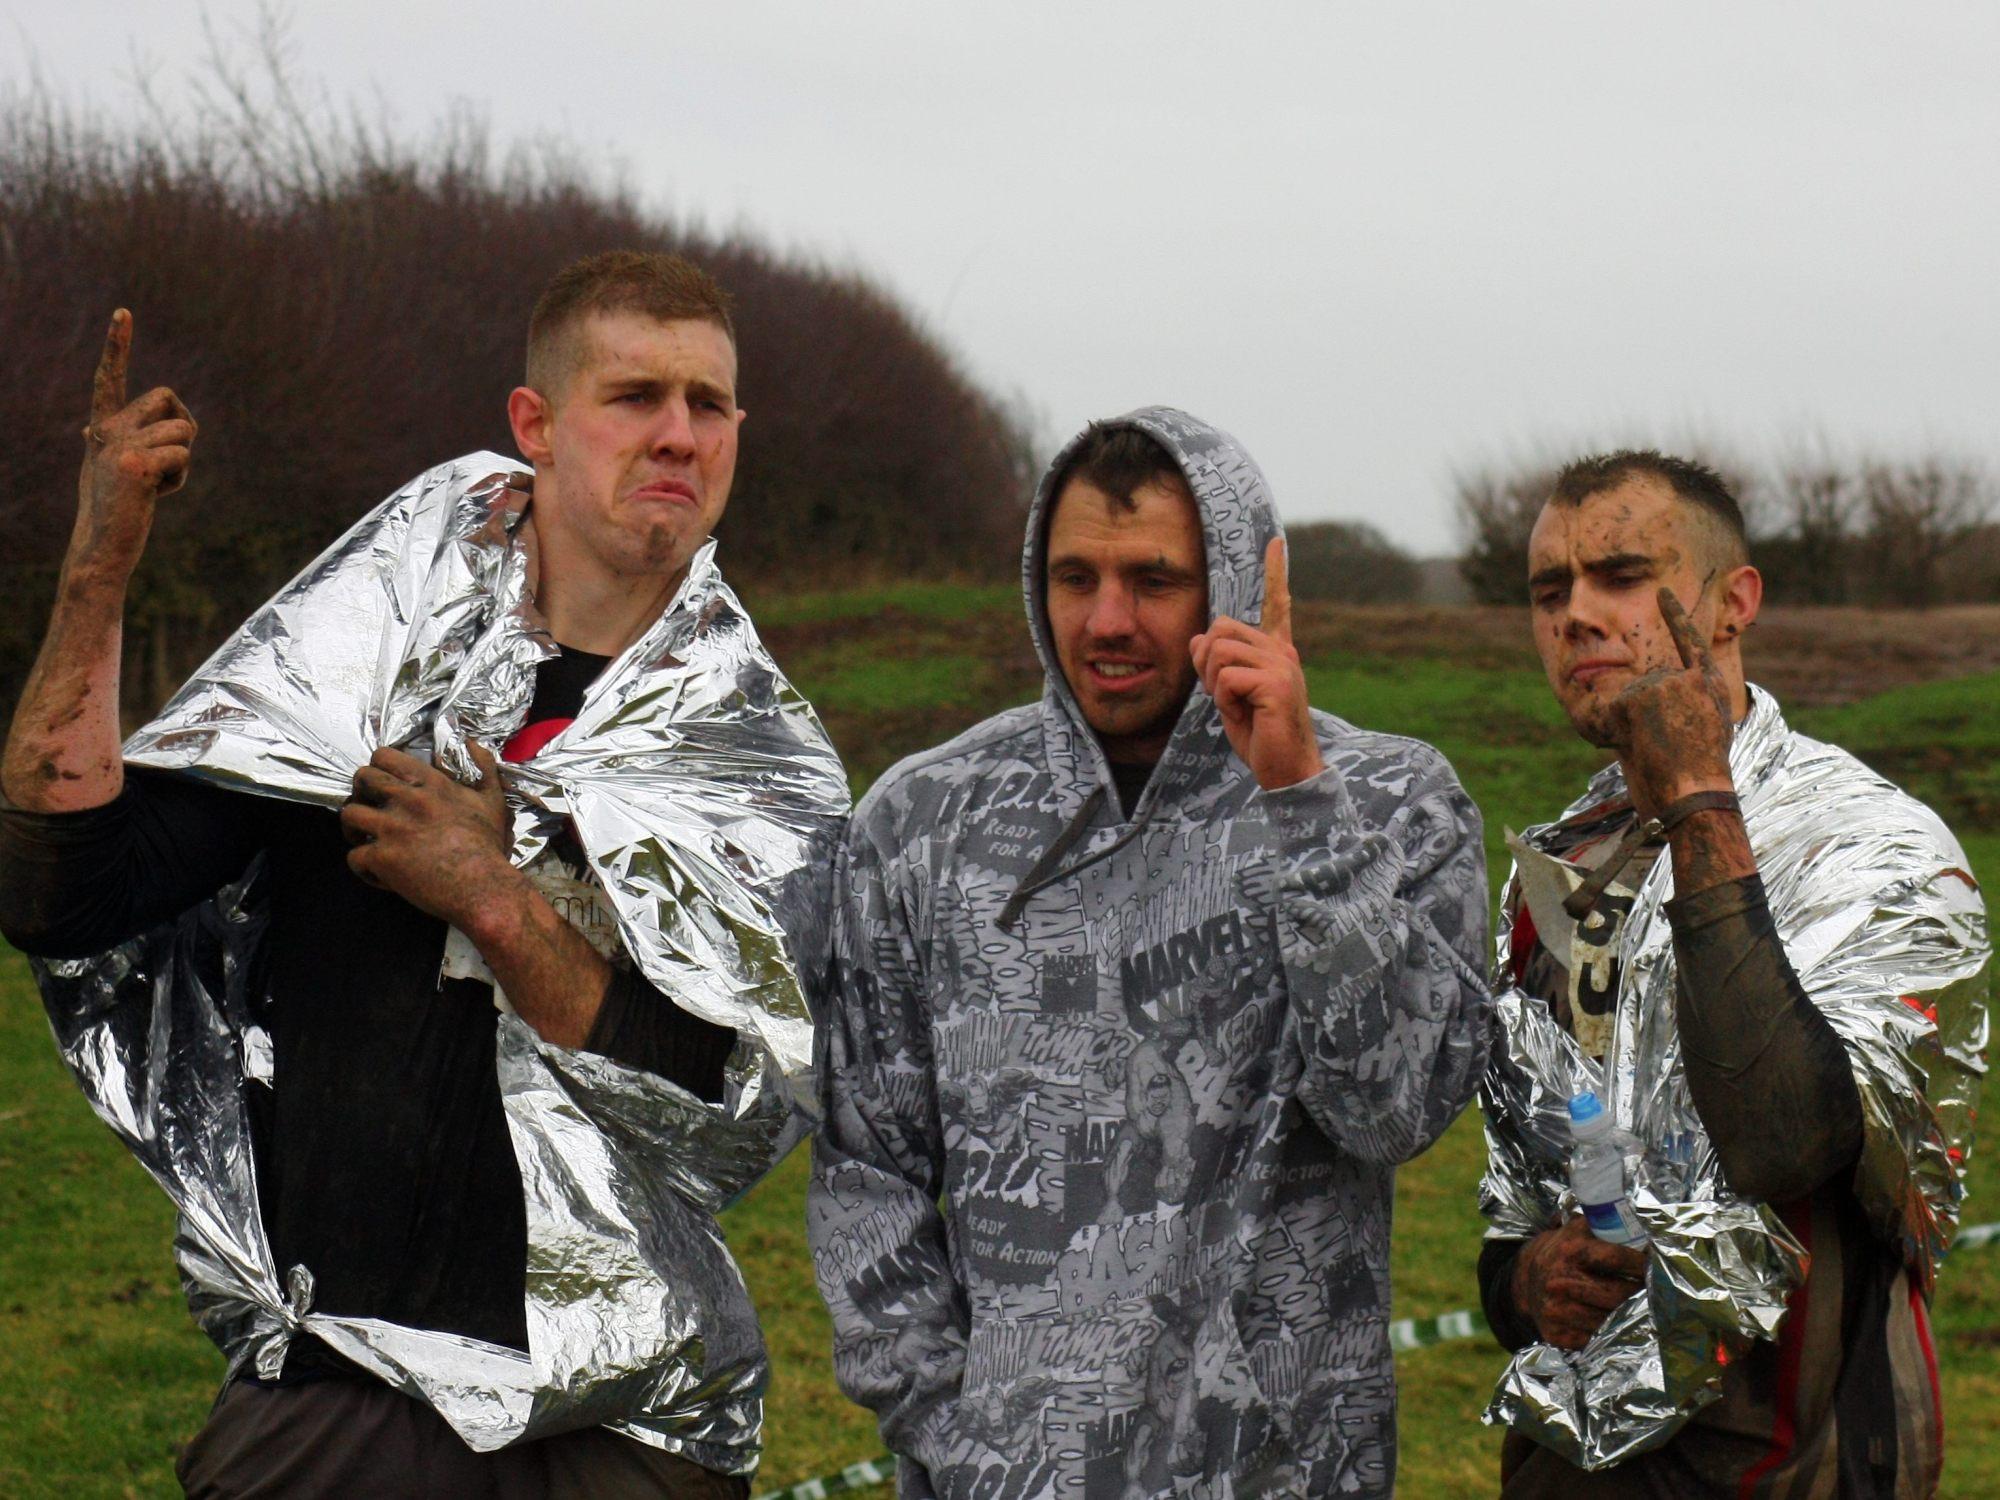 Mud Sweat and Beers Mud Run